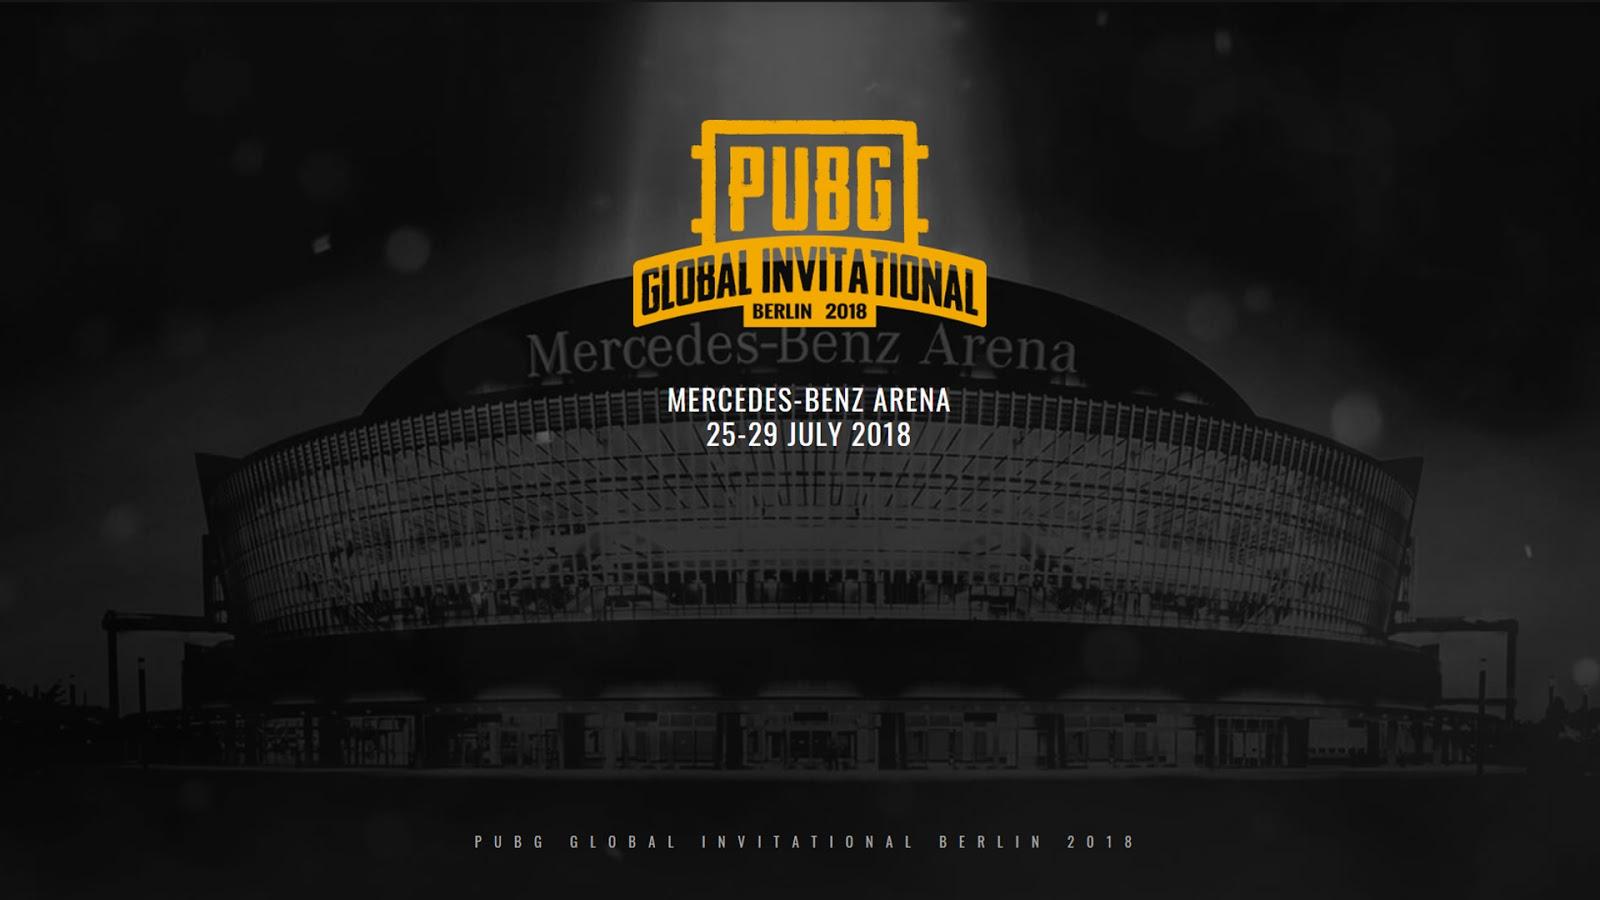 Pubg Ogn: [배그]PUBG GLOBAL INVITATIONAL 베를린 2018